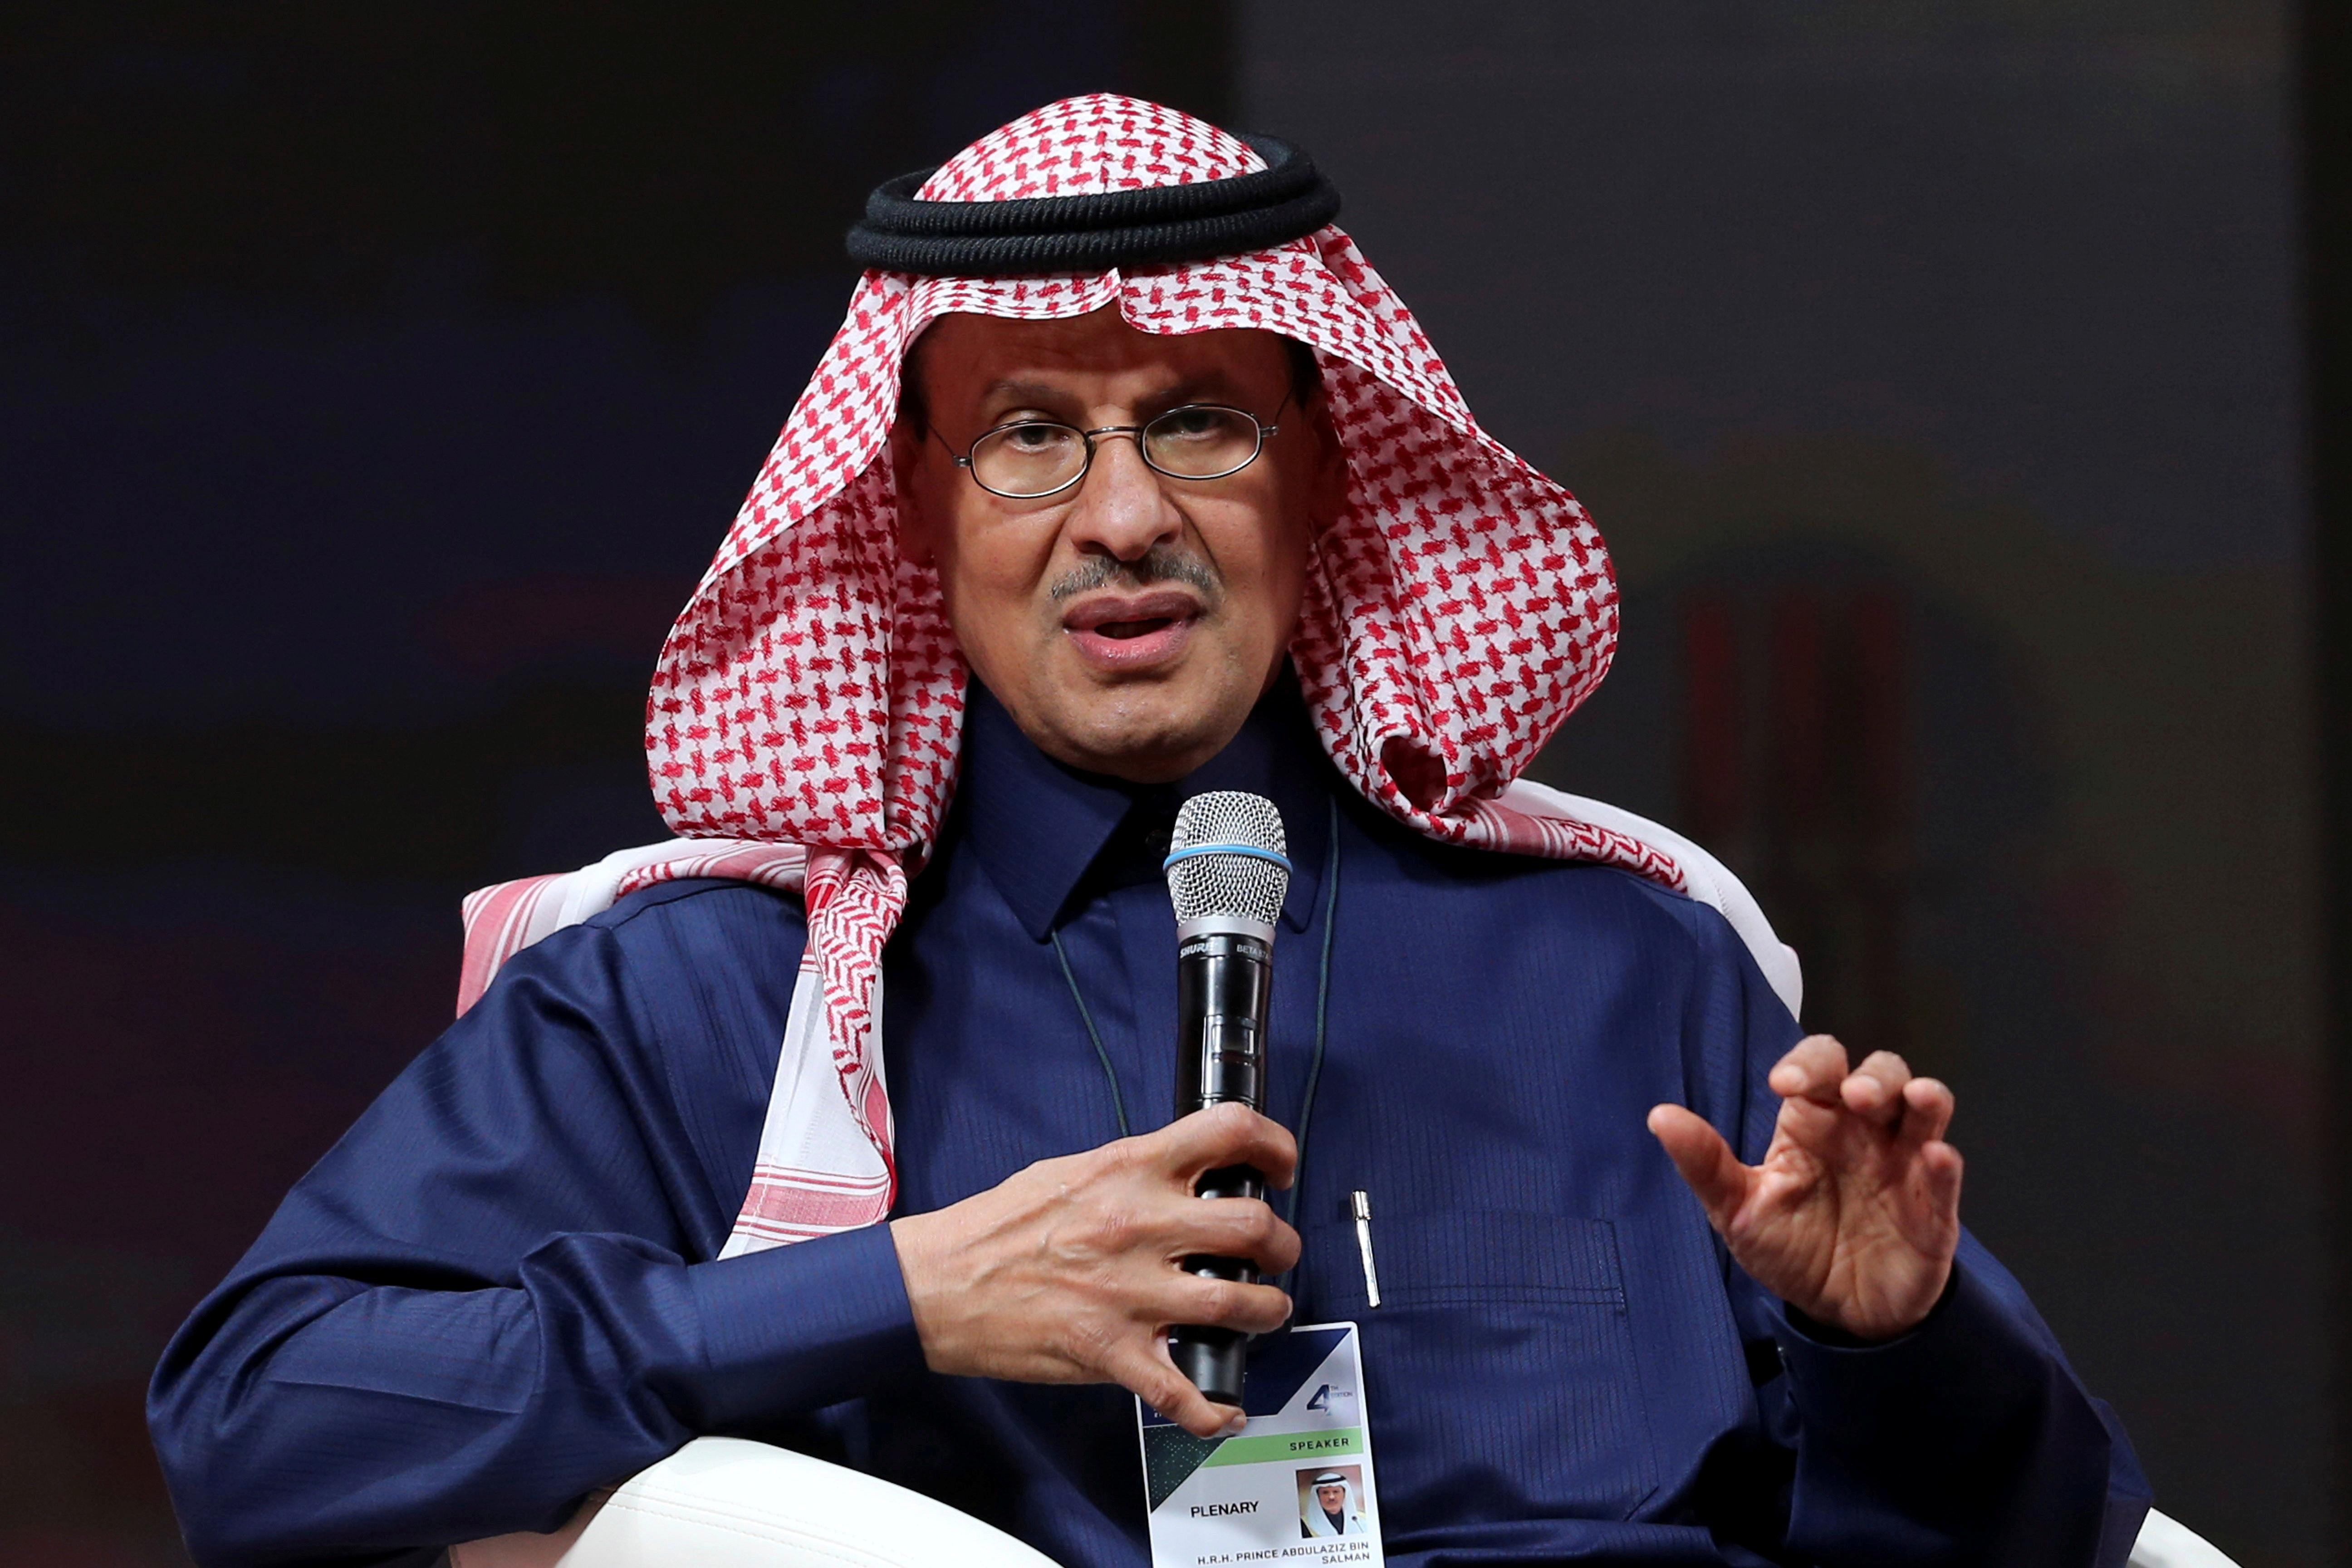 Saudi Energy Minister, Prince Abdulaziz bin Salman al-Saud, speaks during the fourth annual Future Investment Initiative in Riyadh, Saudi Arabia, January 27, 2021. REUTERS/Ahmed Yosri/File Photo